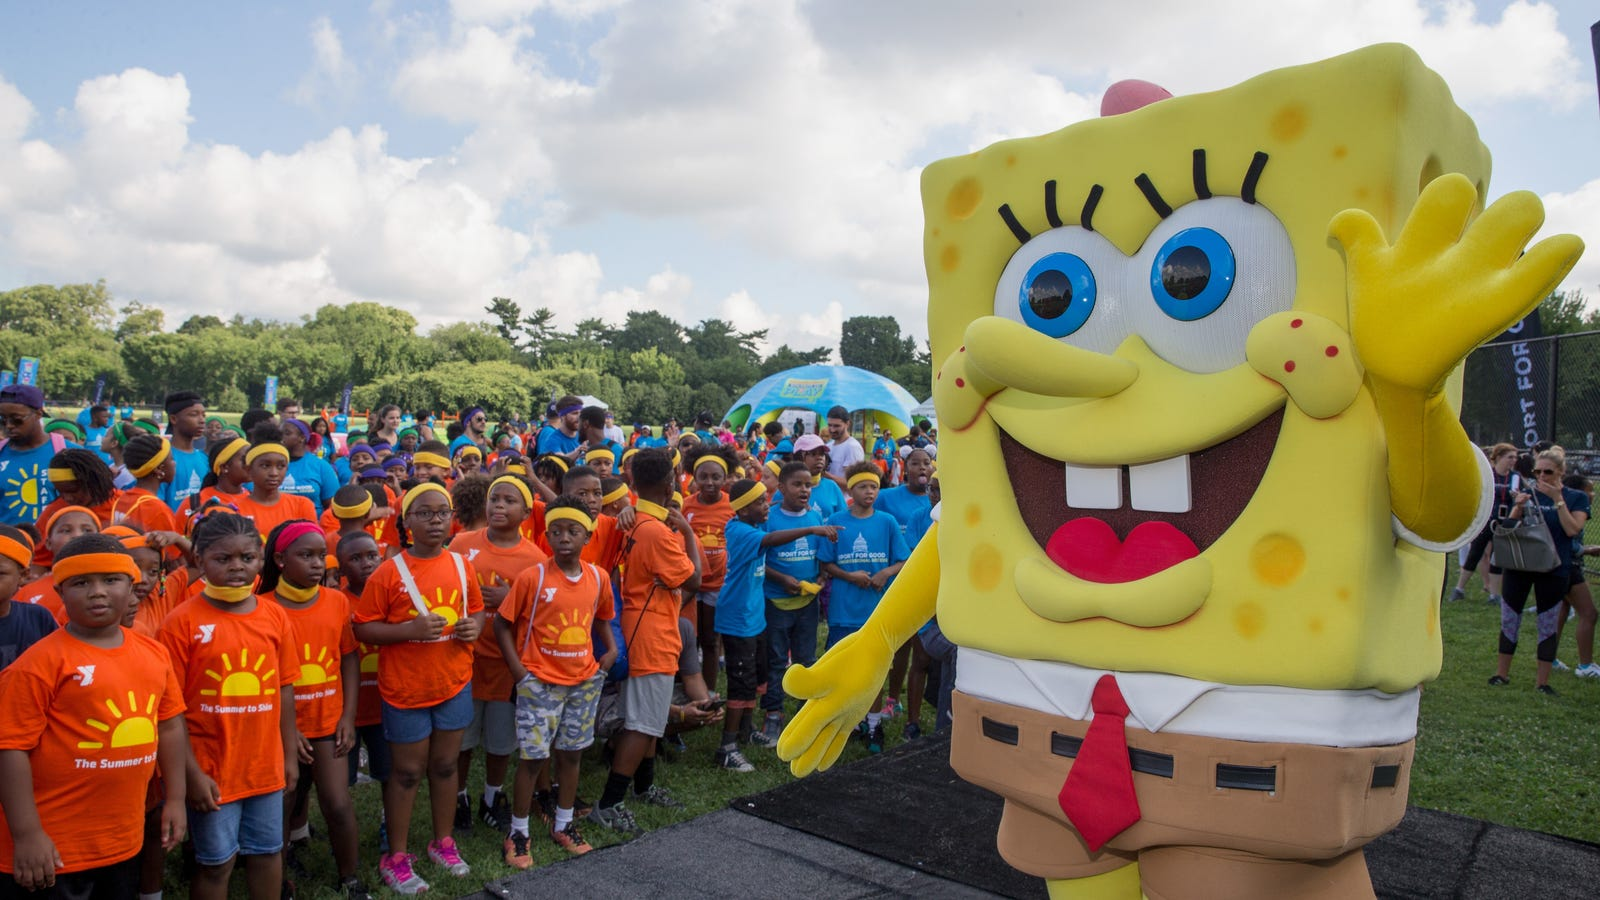 Nickelodeon announces computer-generated 'SpongeBob' prequel series